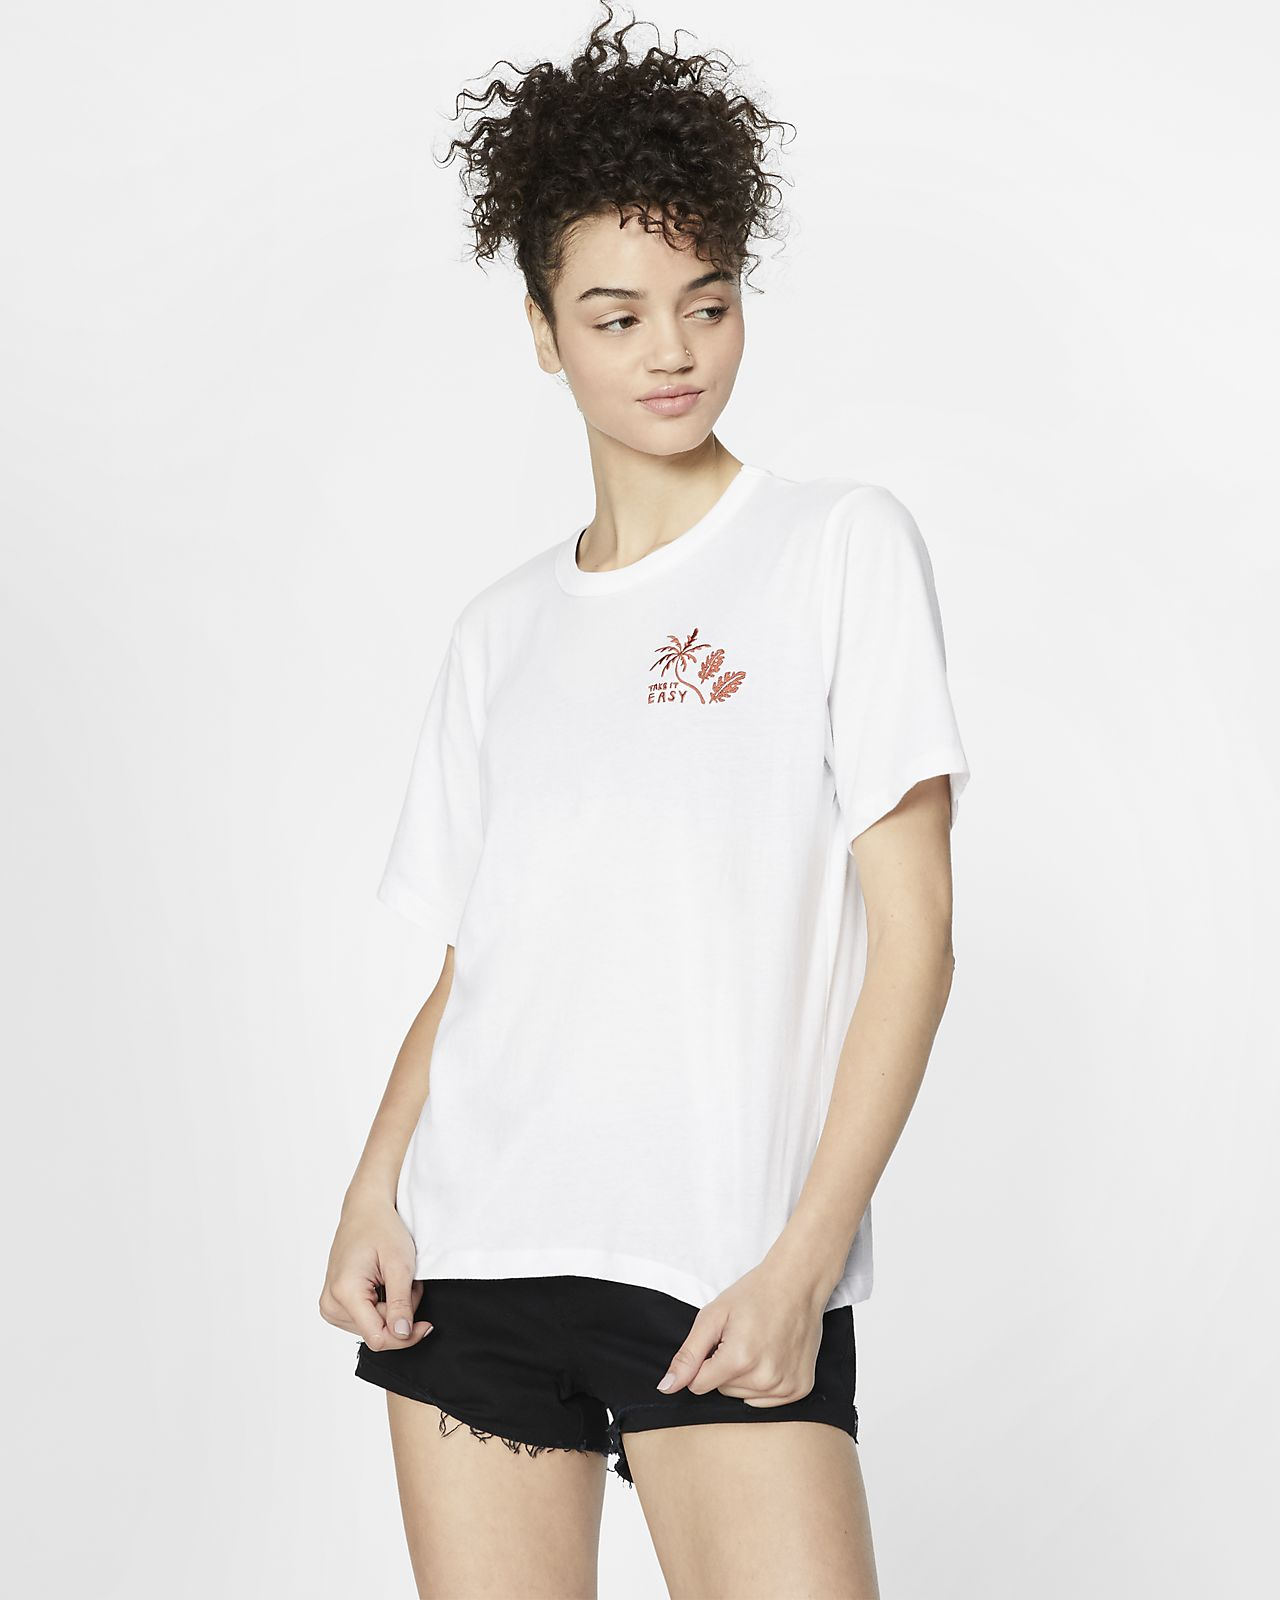 Hurley Take It Easy Women's T-Shirt